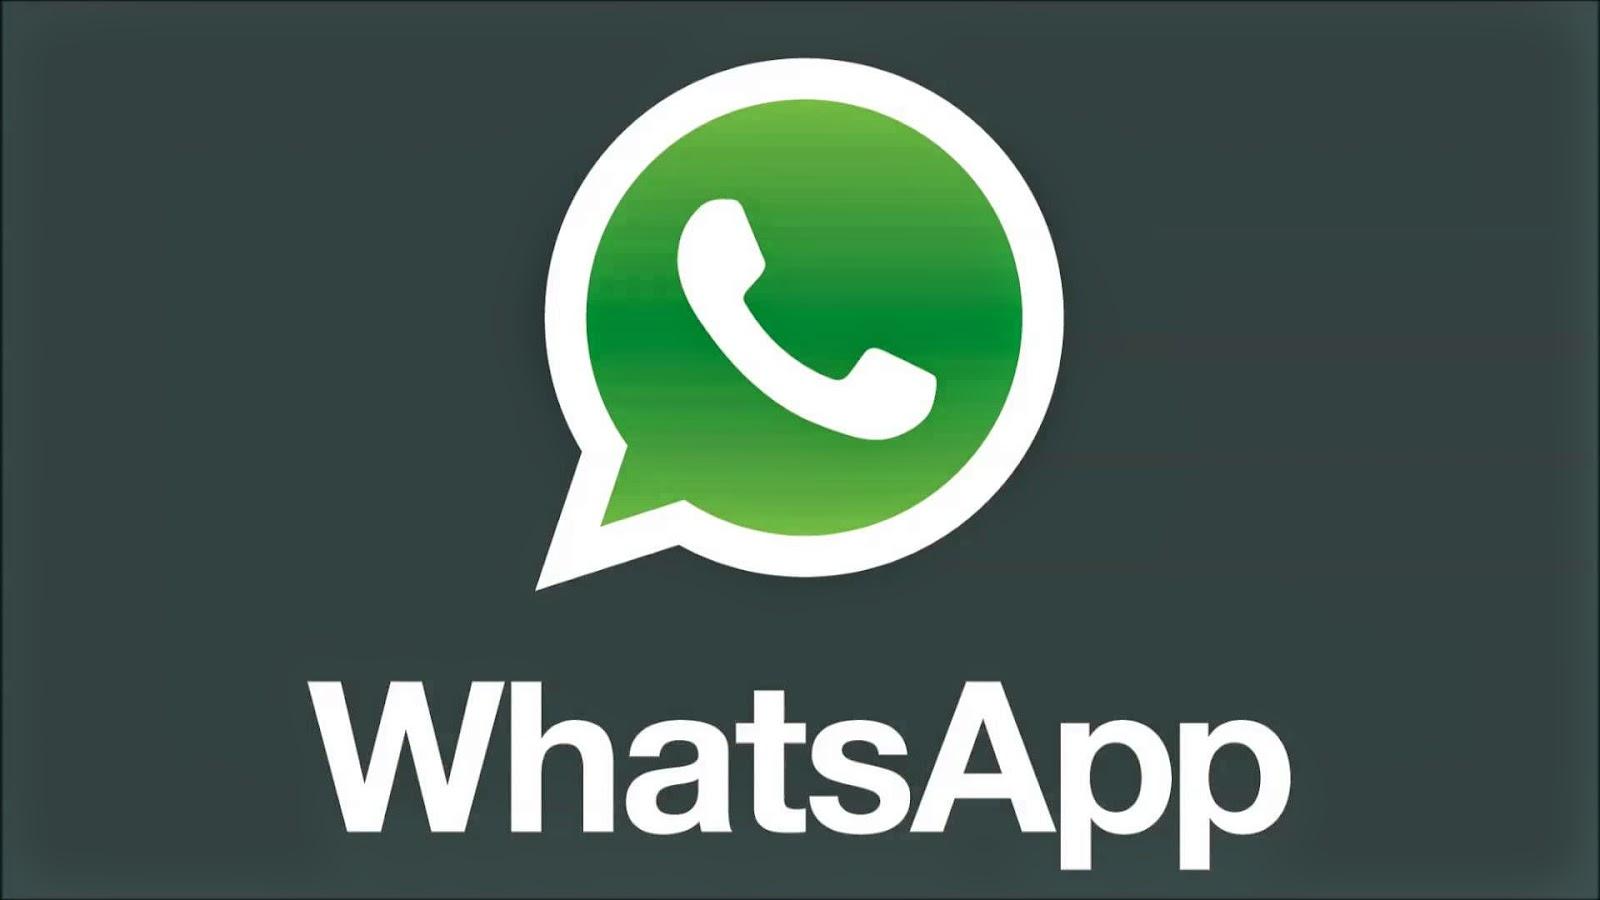 whatsapp fransoluciones